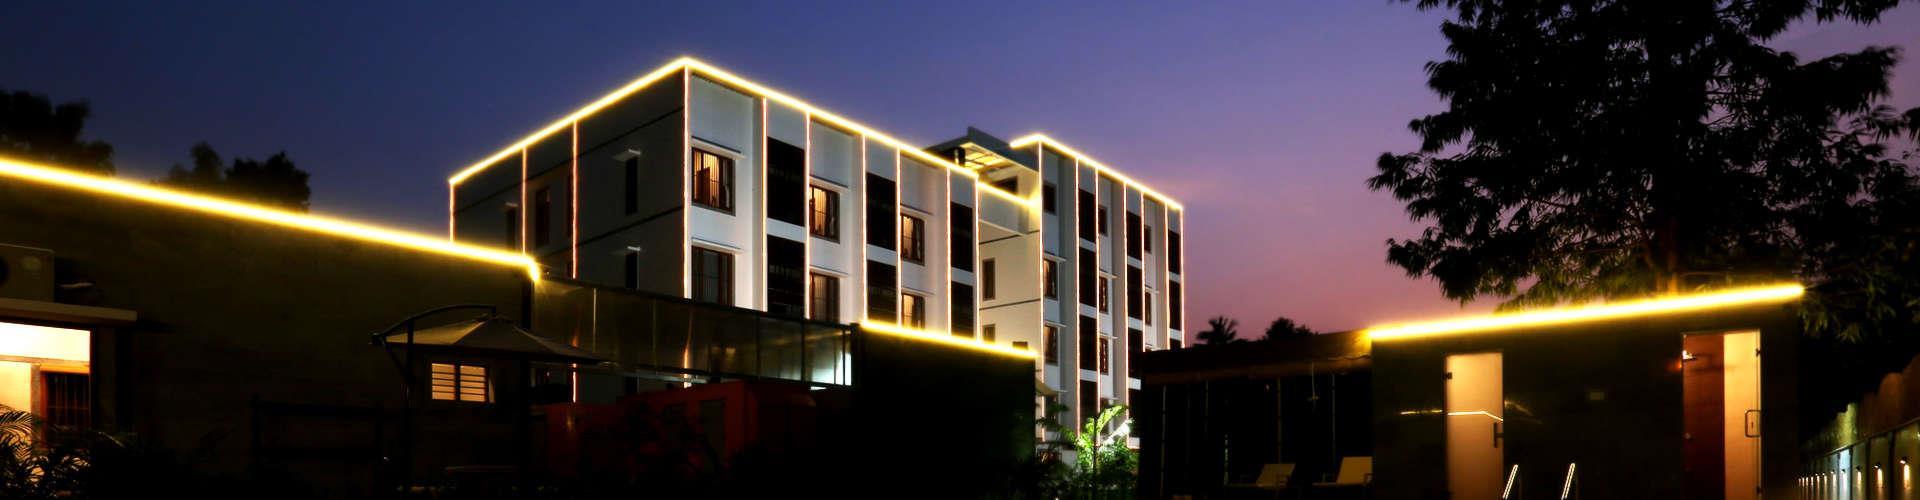 The best hotel-luxury in kumbakonam.  we are one of the leading luxury hotels in kumbakonam. we provide luxury & comfort feel  in  mayapuri Amira. - by Mayapuri Amira, Kumbakonam